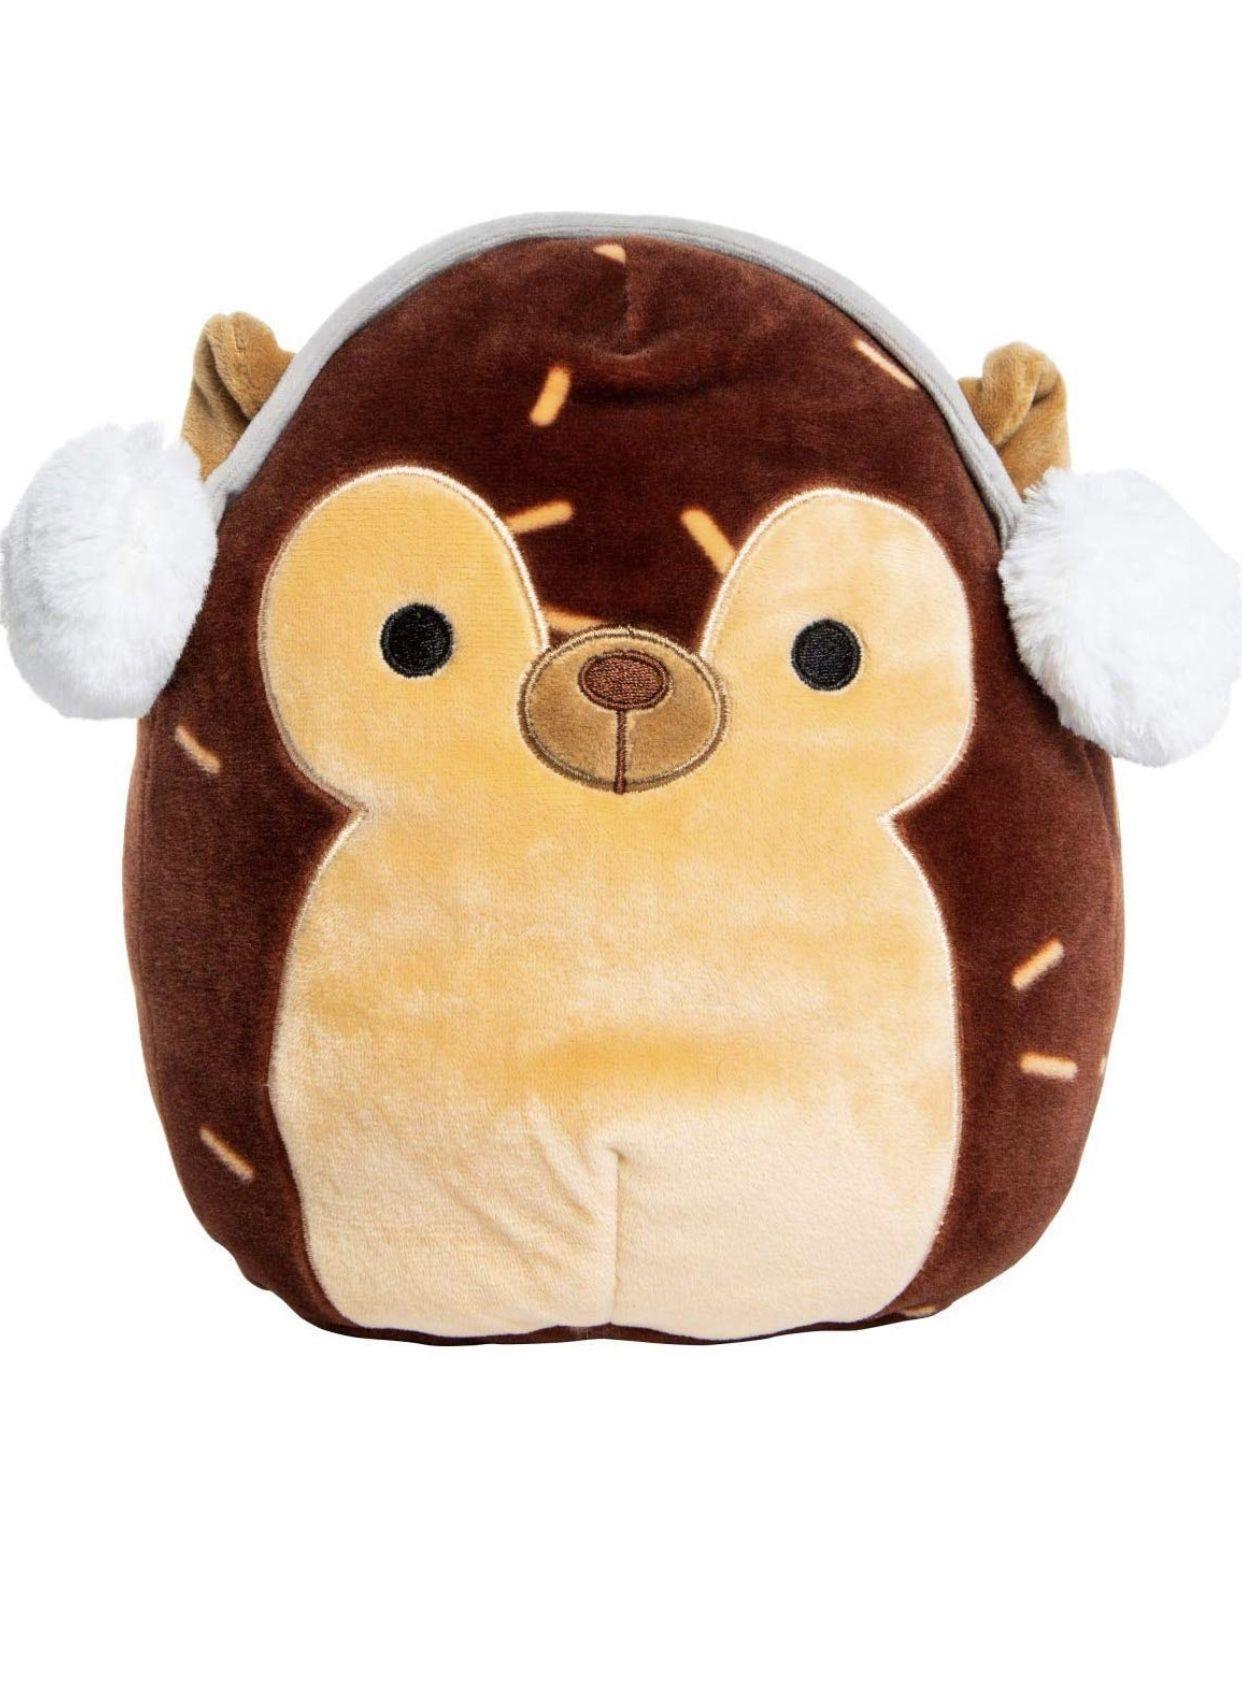 Squishmallow 8 Inch Hans The Hedgehog With Earmuffs Girls Pillows Pillow Pals Hedgehog [ 1687 x 1242 Pixel ]